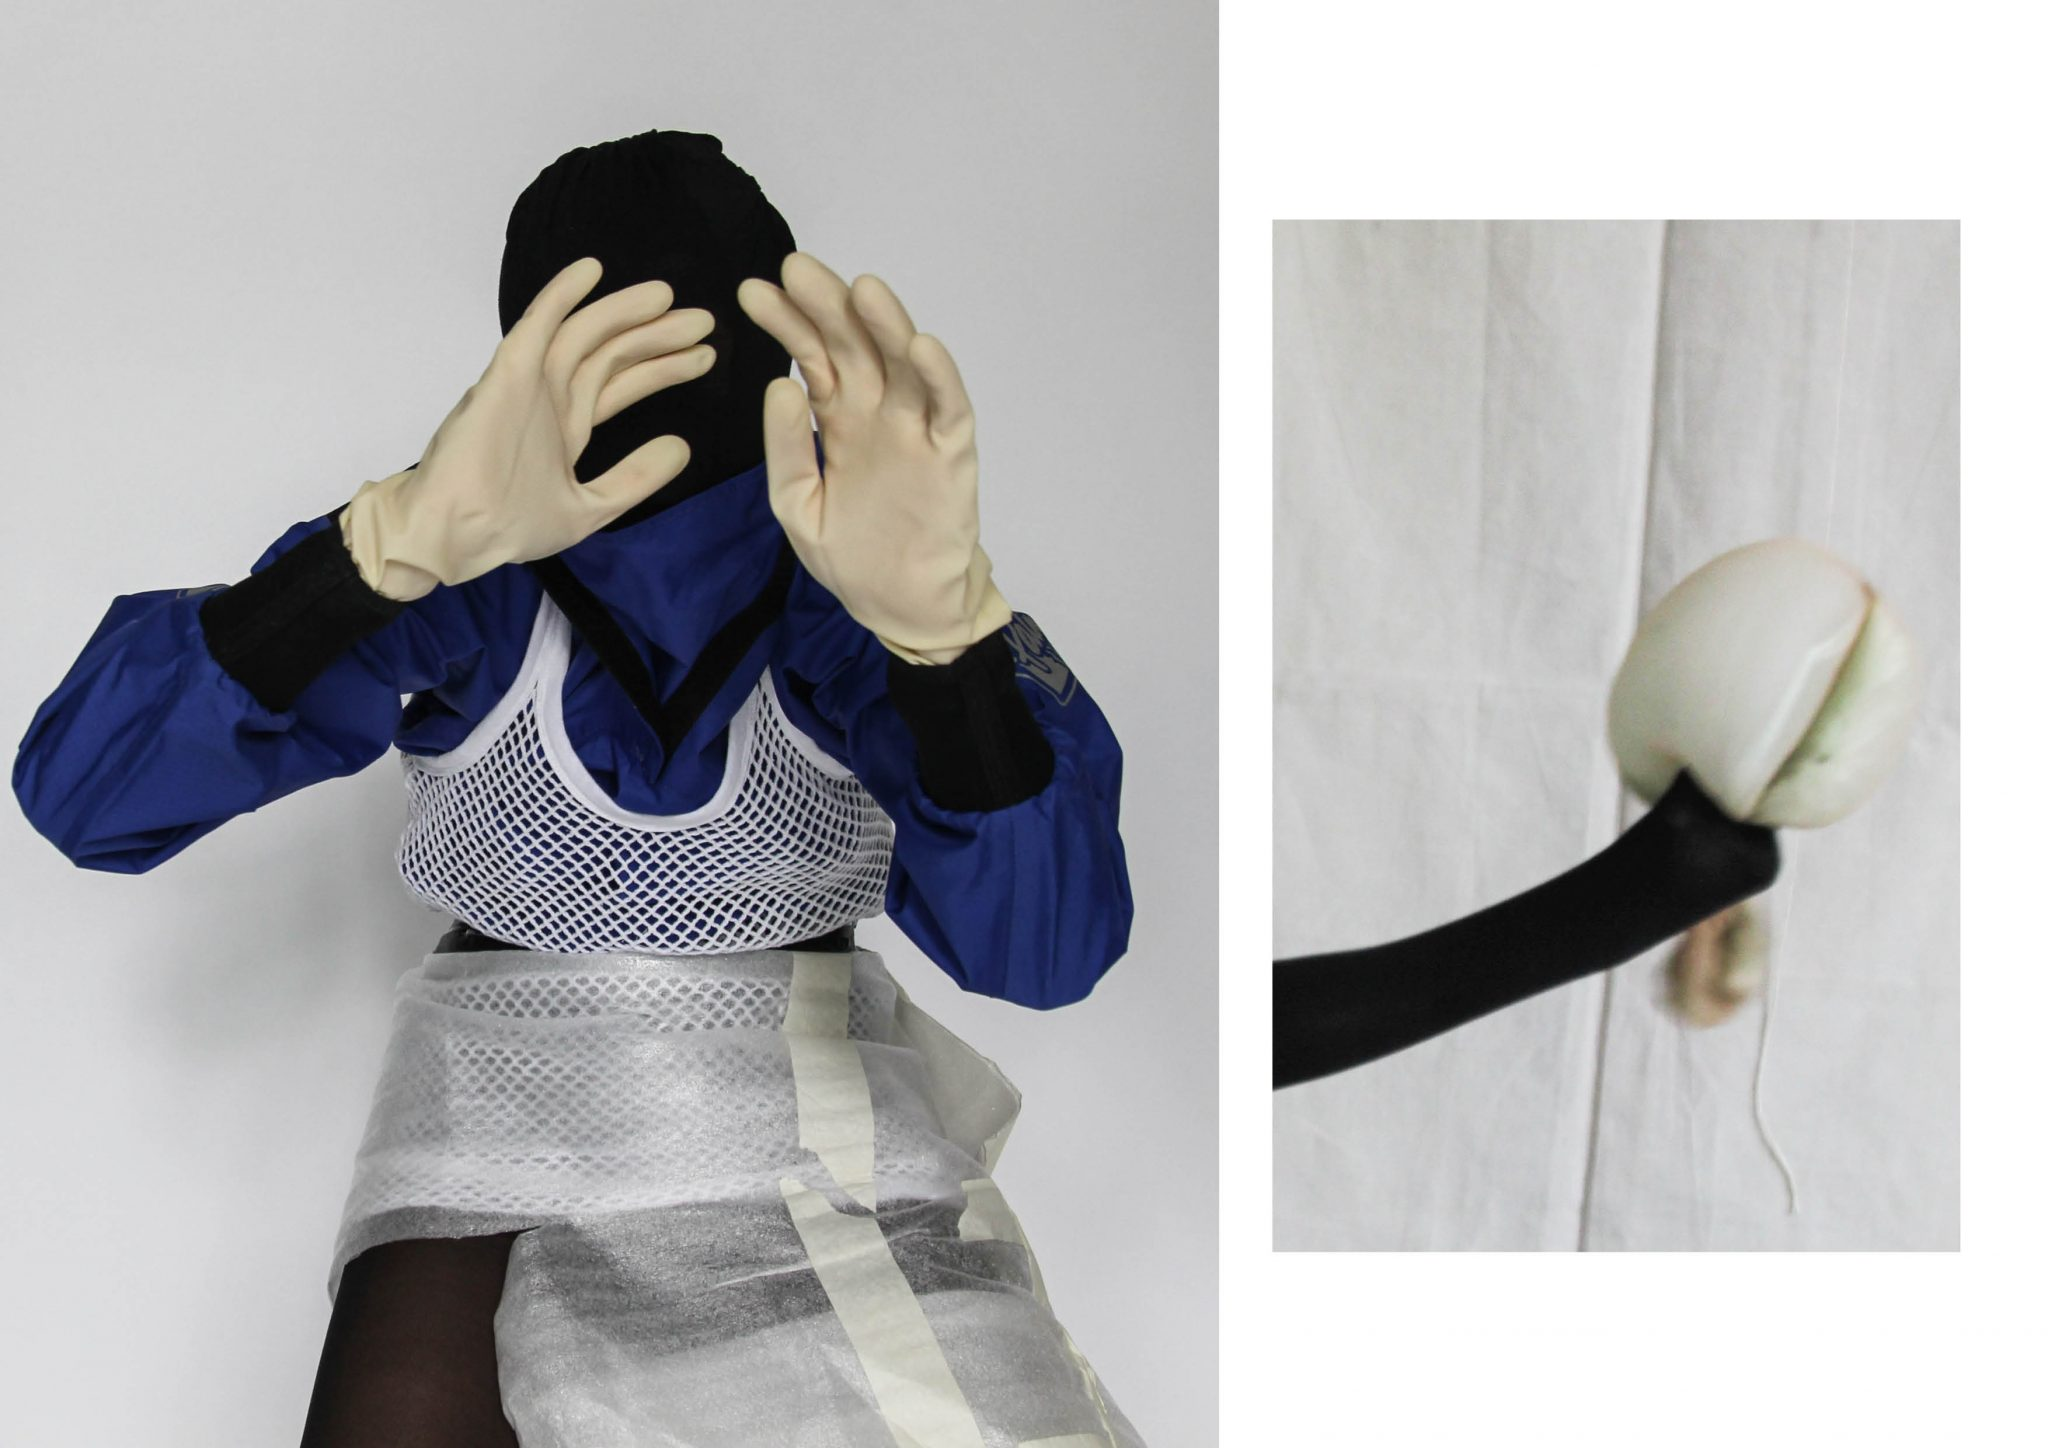 BA (Hons) Fashion Styling and Production graduate Jil Carrara.